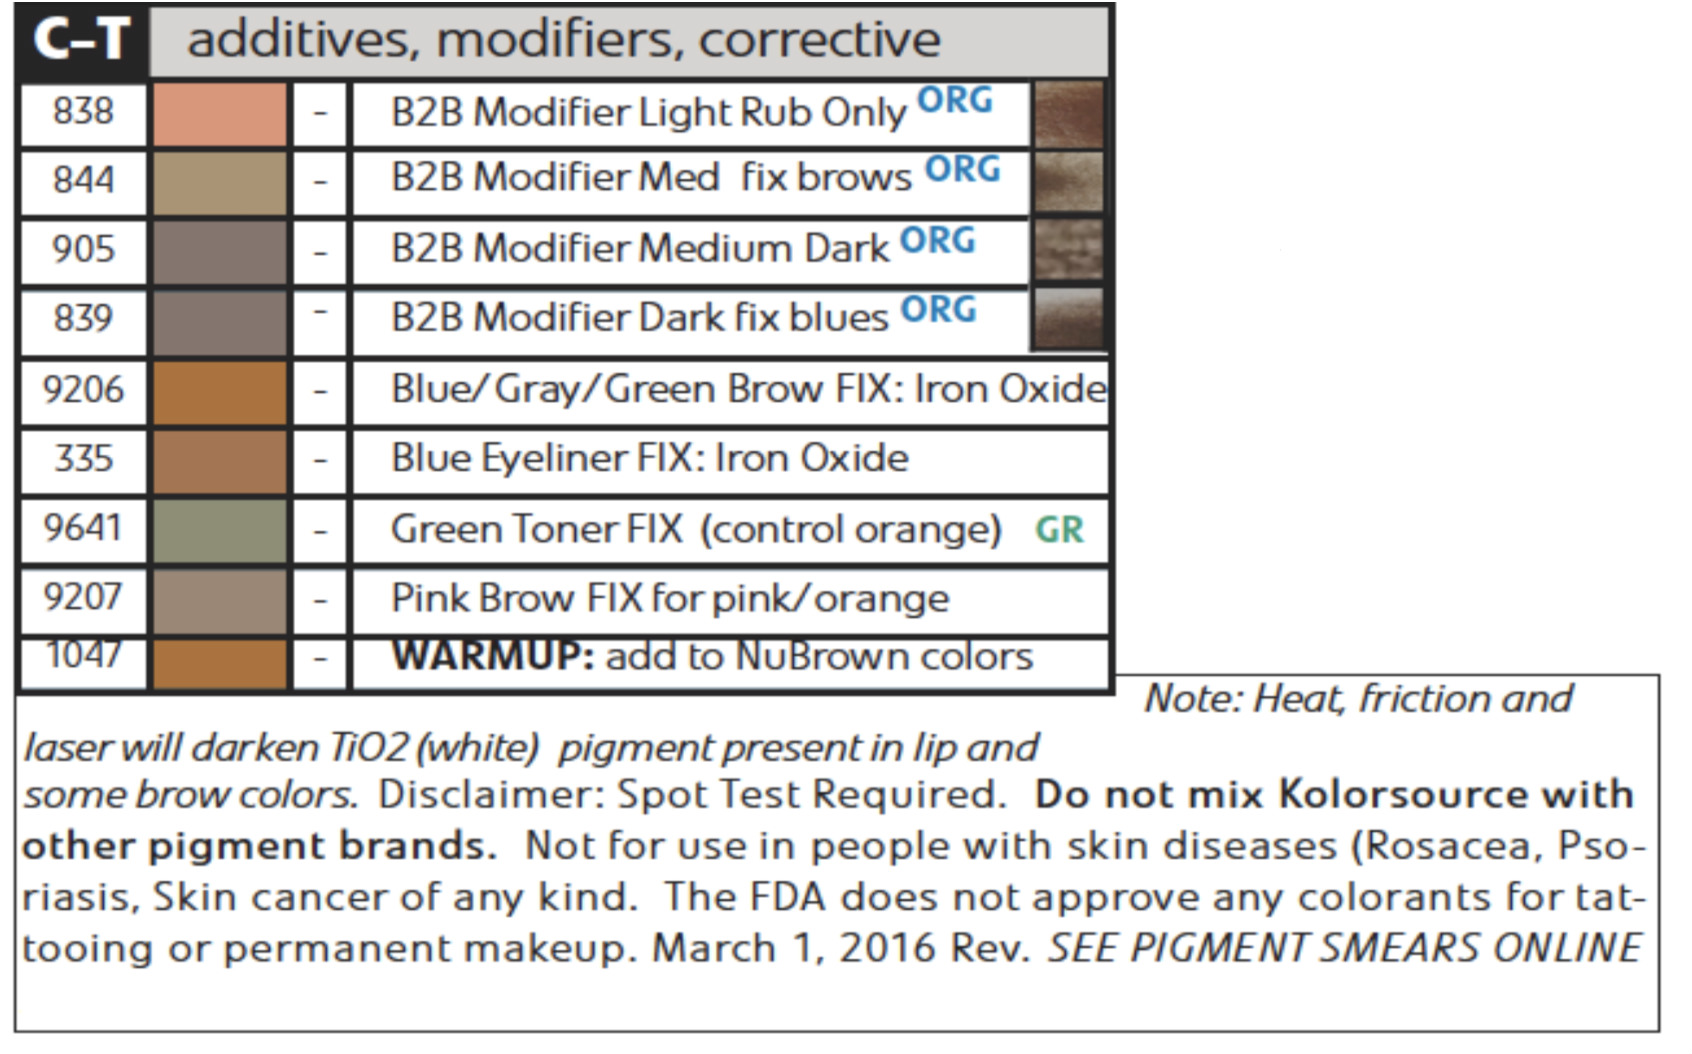 c-t-additives-modifiers-corrective.jpg